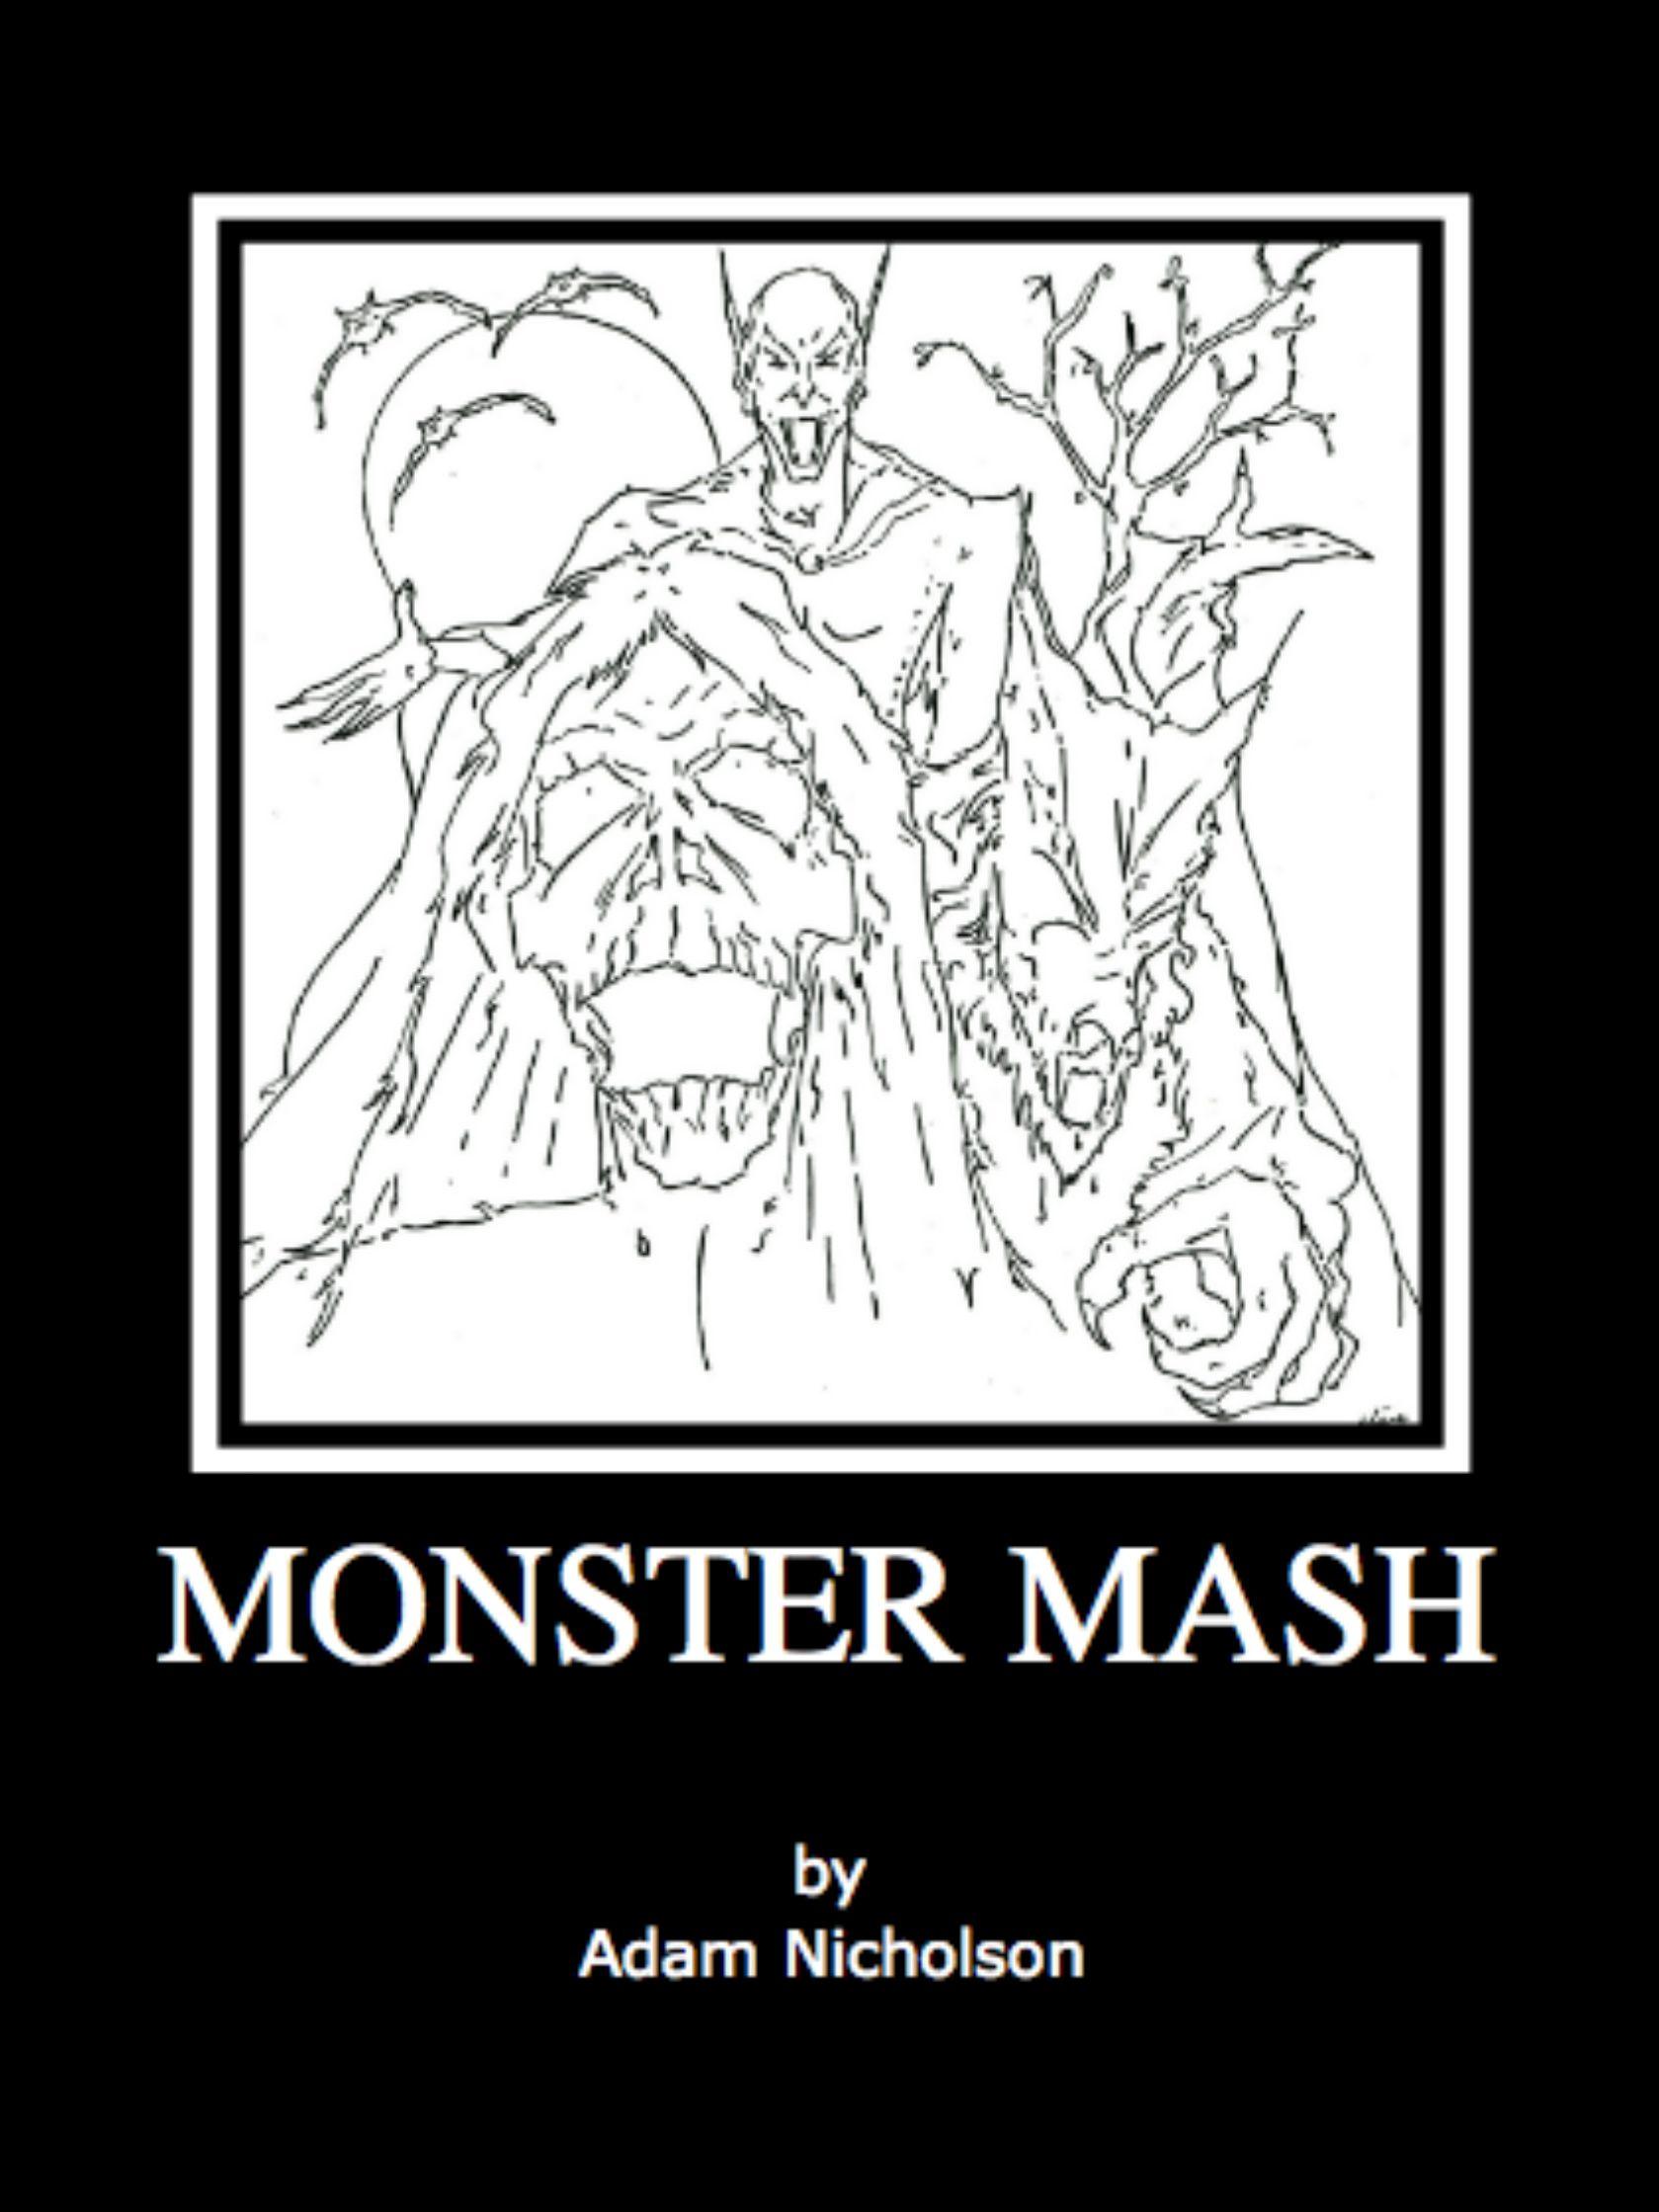 Monster Mash by Adam Nicholson